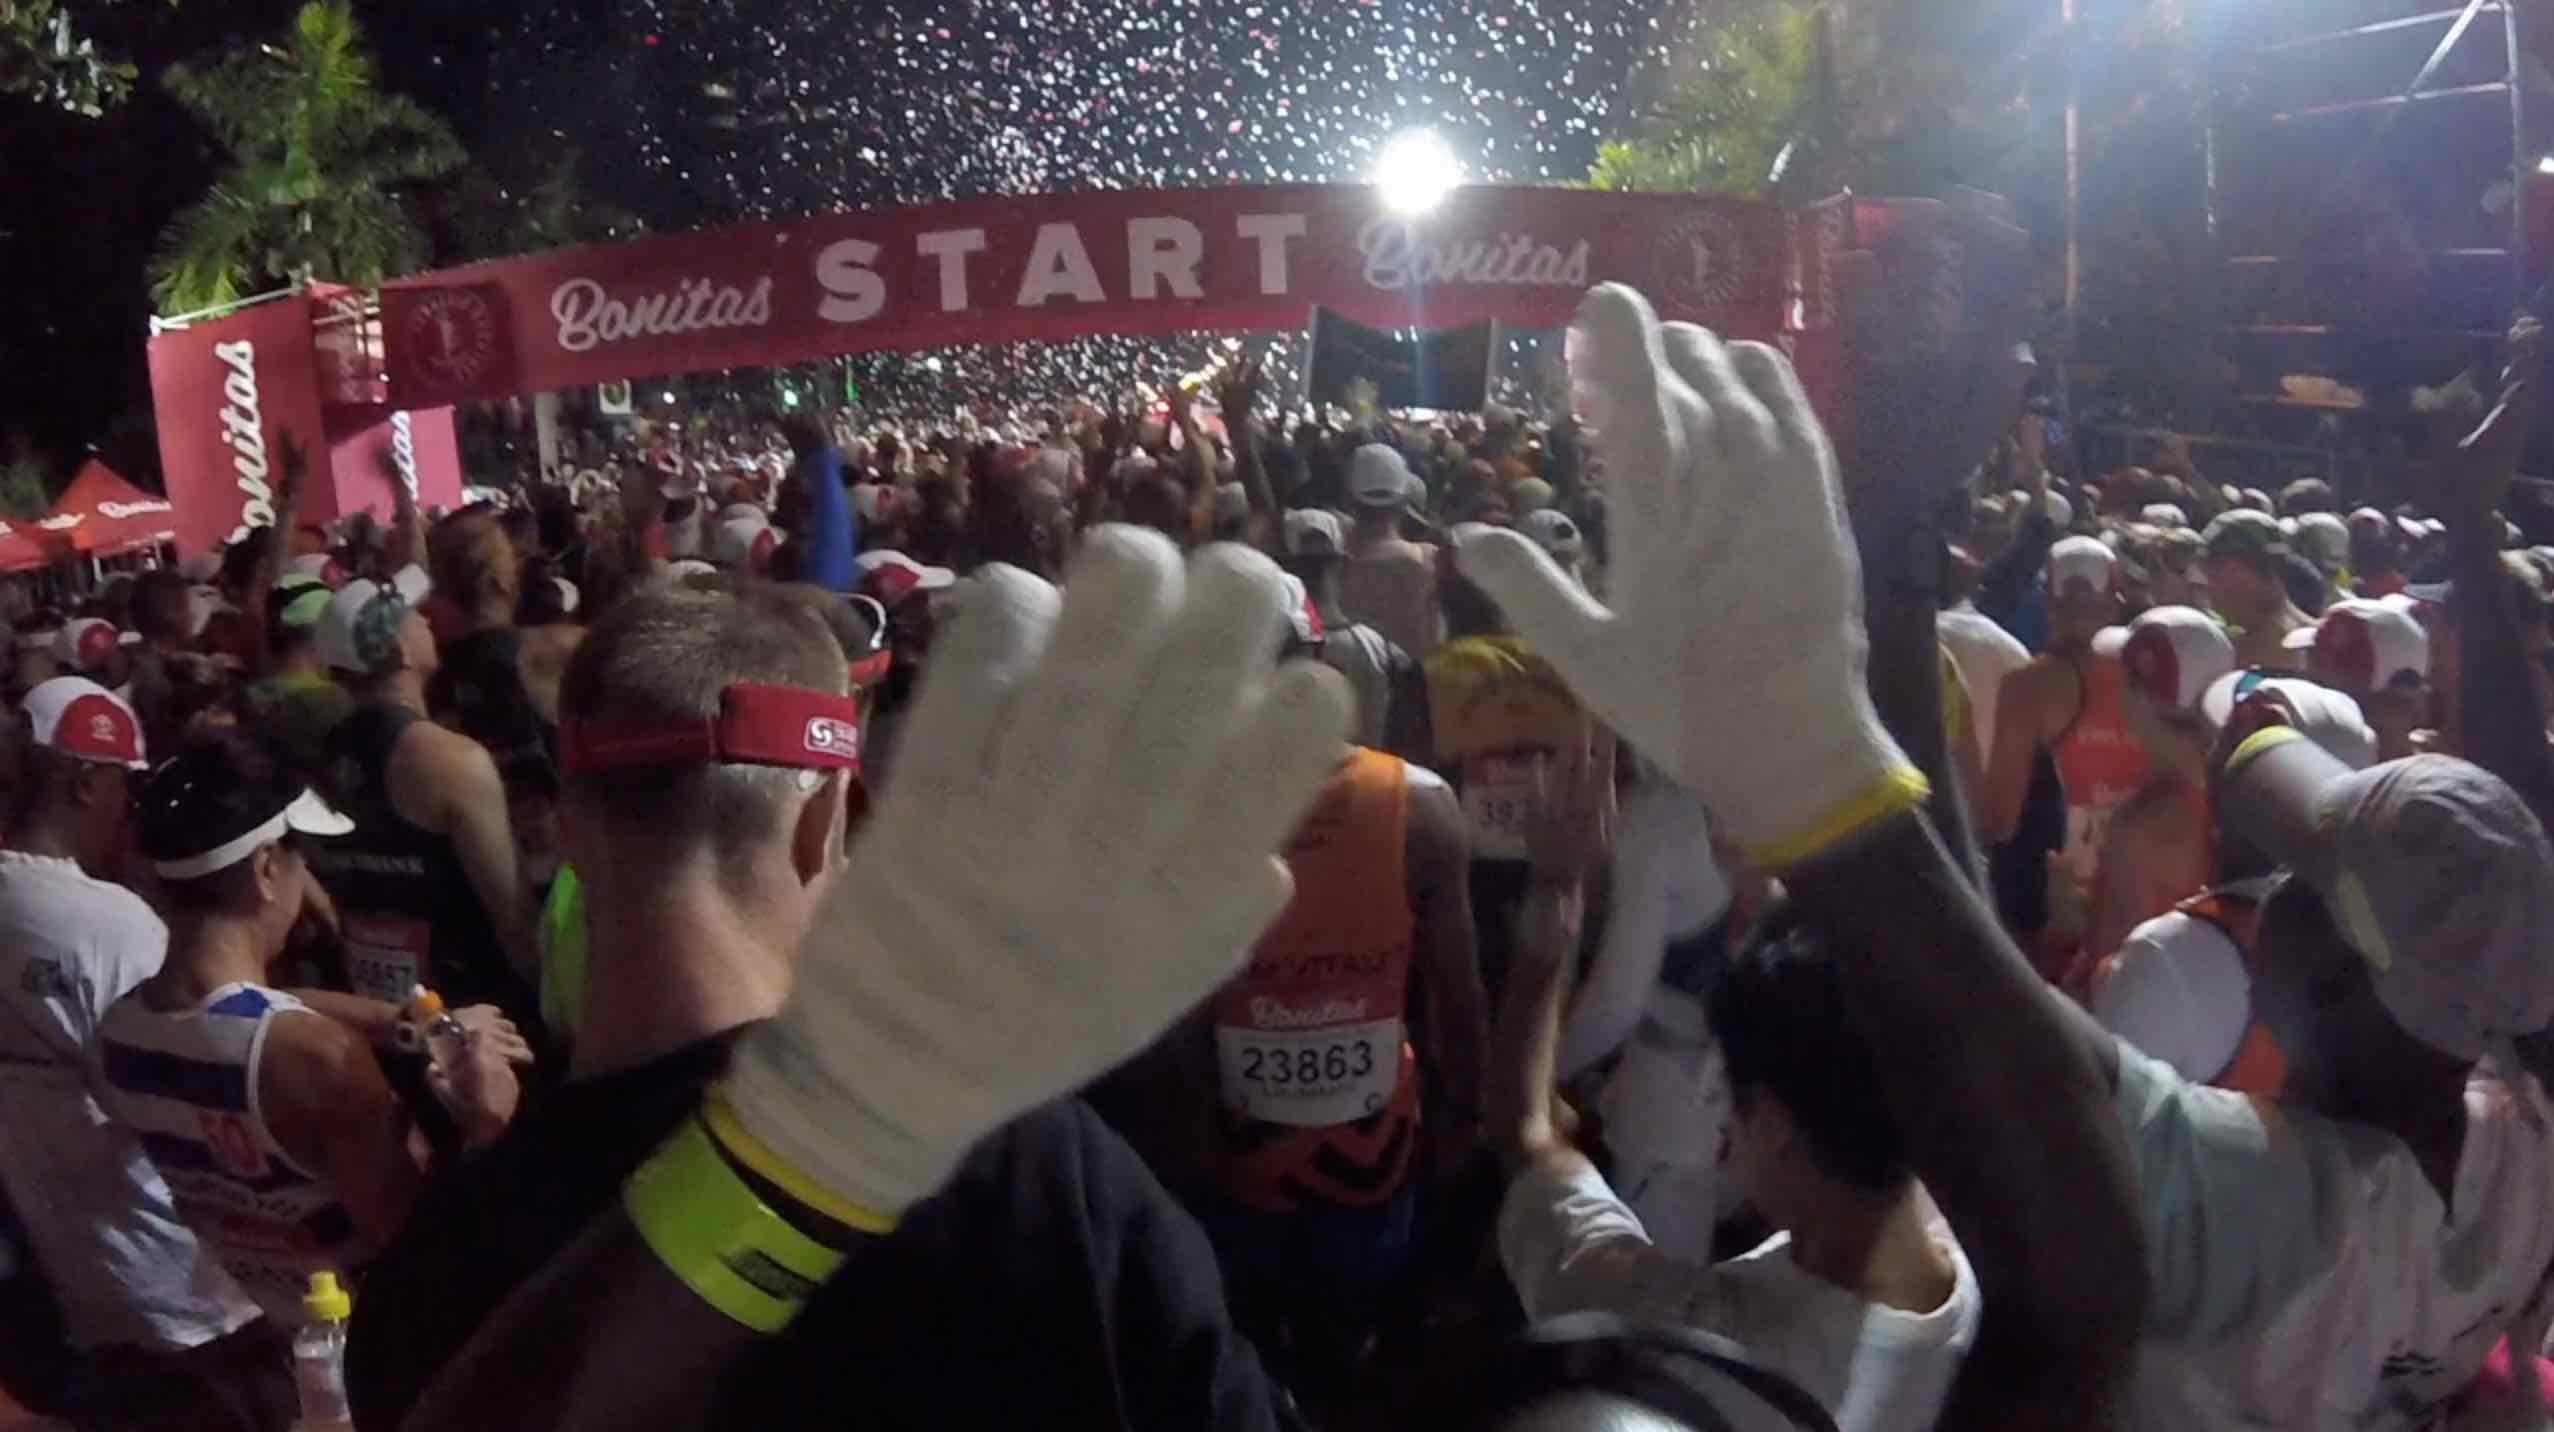 Comrades Marathon start